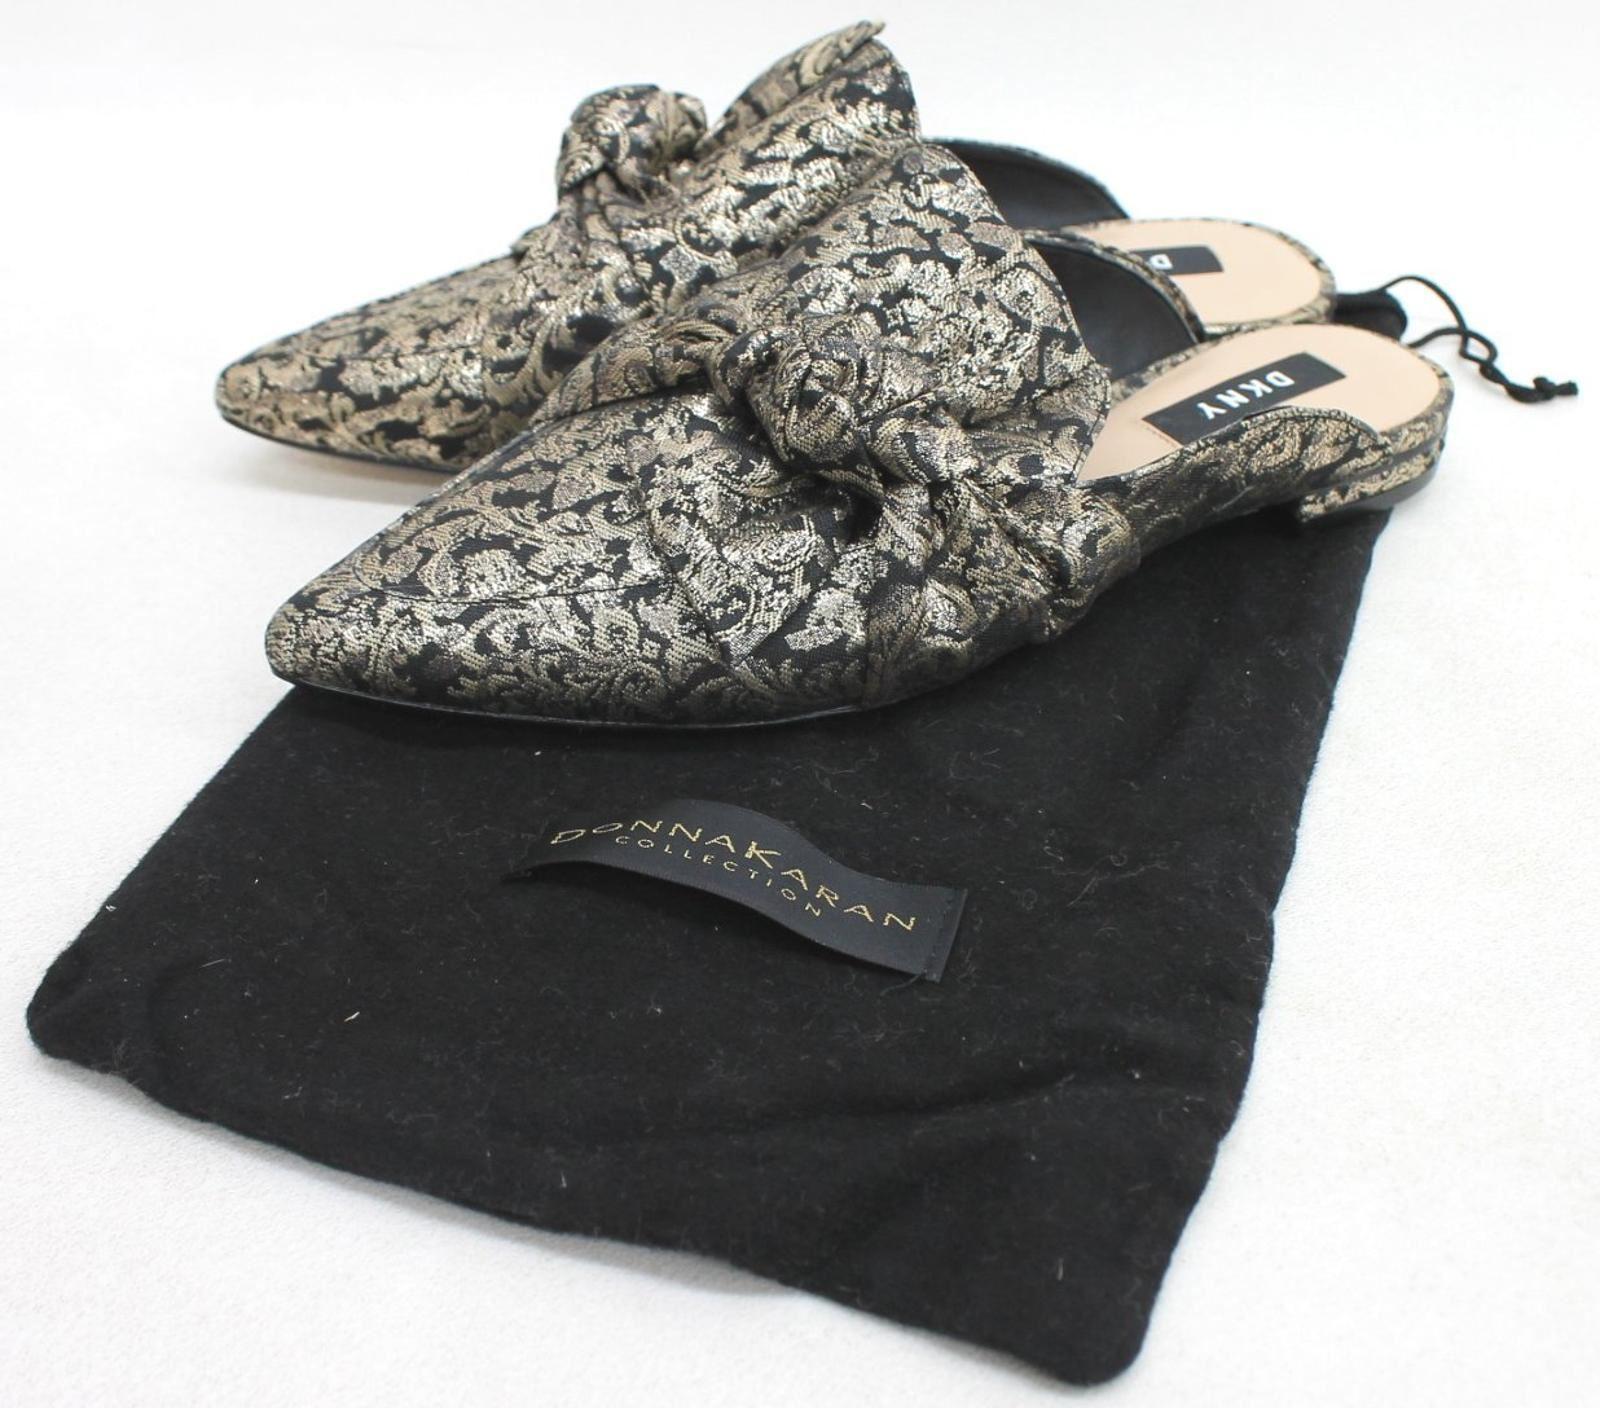 DKNY-Ladies-Black-Gold-Filigree-Bow-Detail-Slip-On-Mule-Flats-Shoes-UK4-5-EU37-5